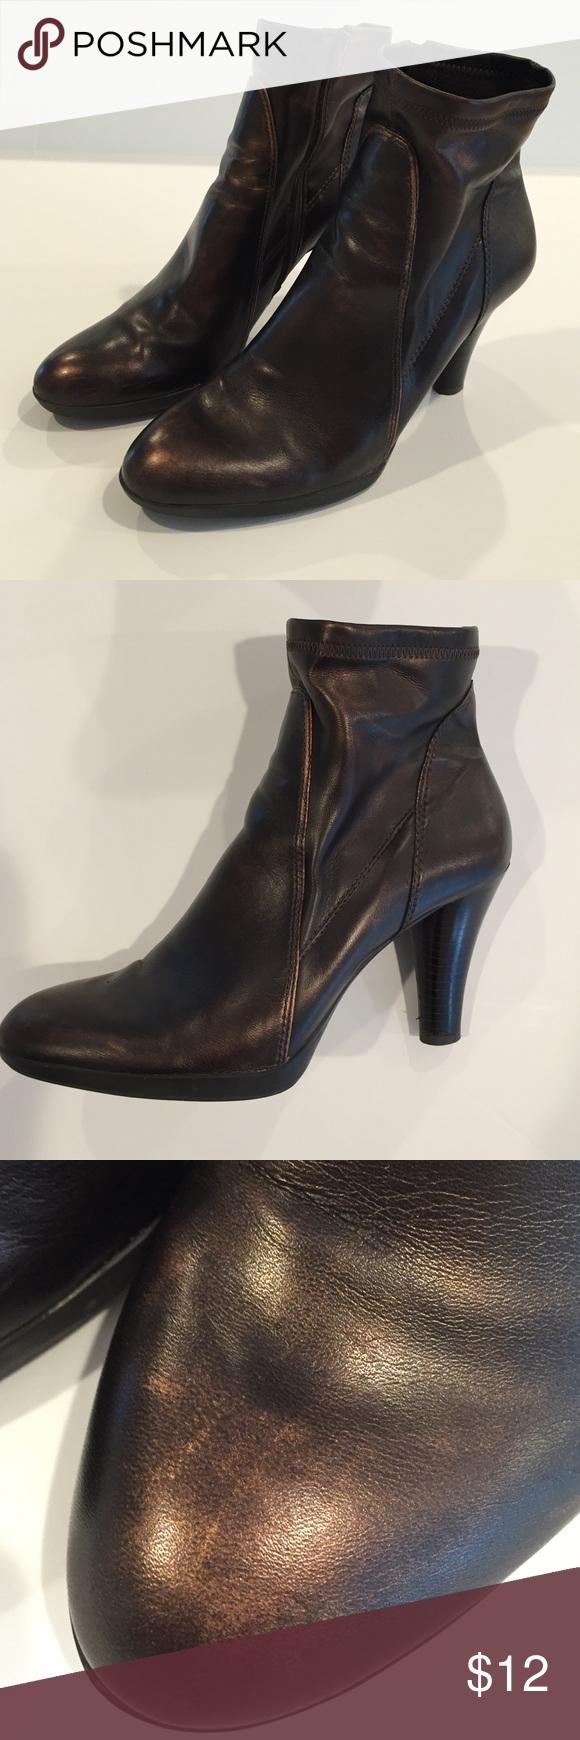 de2789ebd273 Franco sarto ankle boots rust metallic color ankle boots rubber soles have  a few png 580x1740